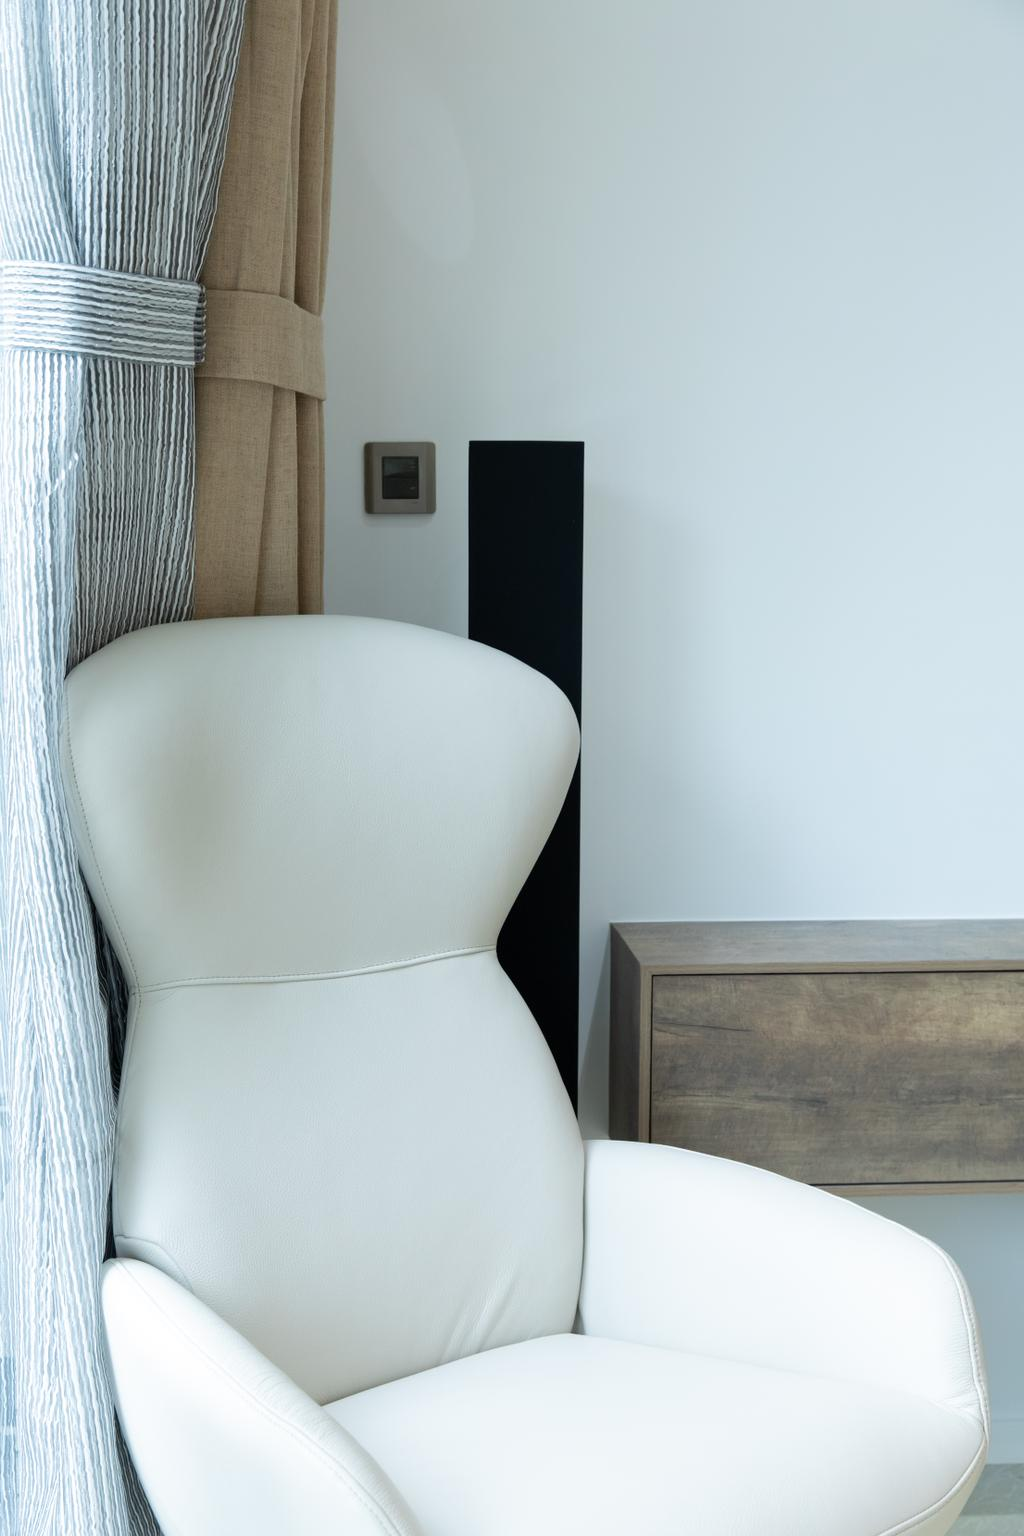 摩登, 私家樓, 客廳, Mount Pavilia, 室內設計師, B.R.G. Interior Design